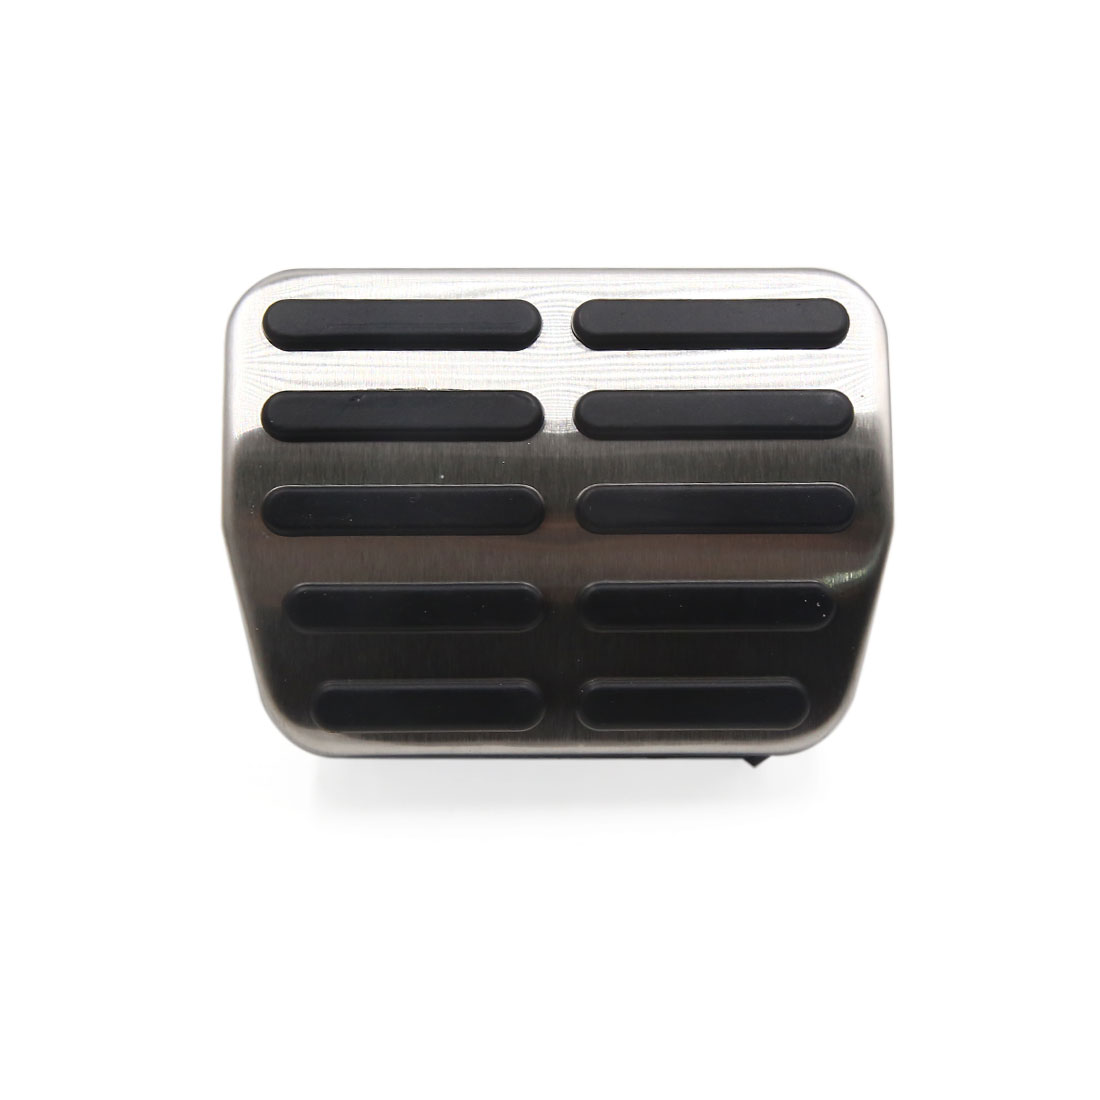 3Pcs Accelerator Brake Foot Footrest Rest Pedals Pad Set for Volkswagen Sagitar - image 2 de 3